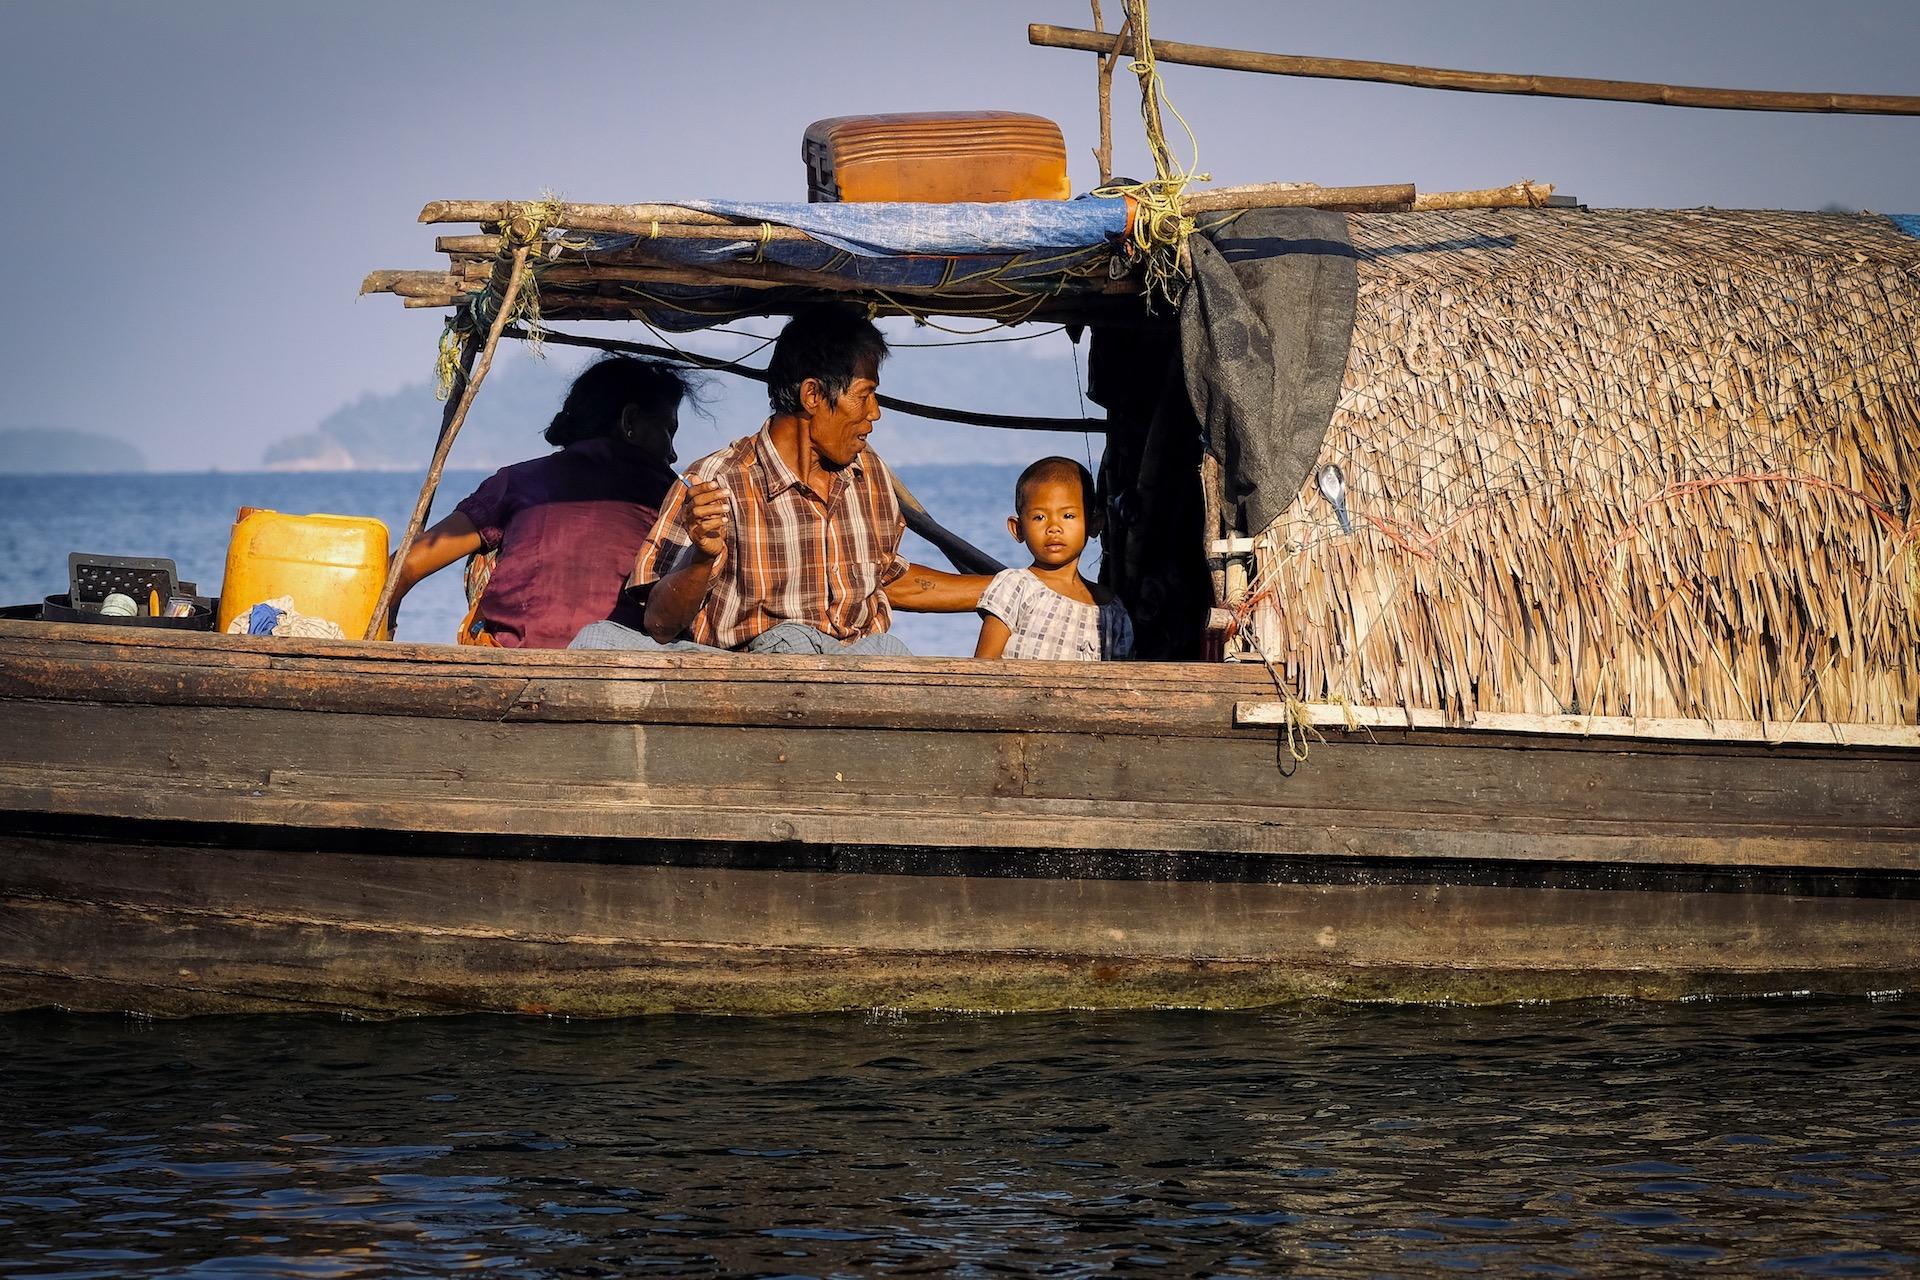 Mergui islands